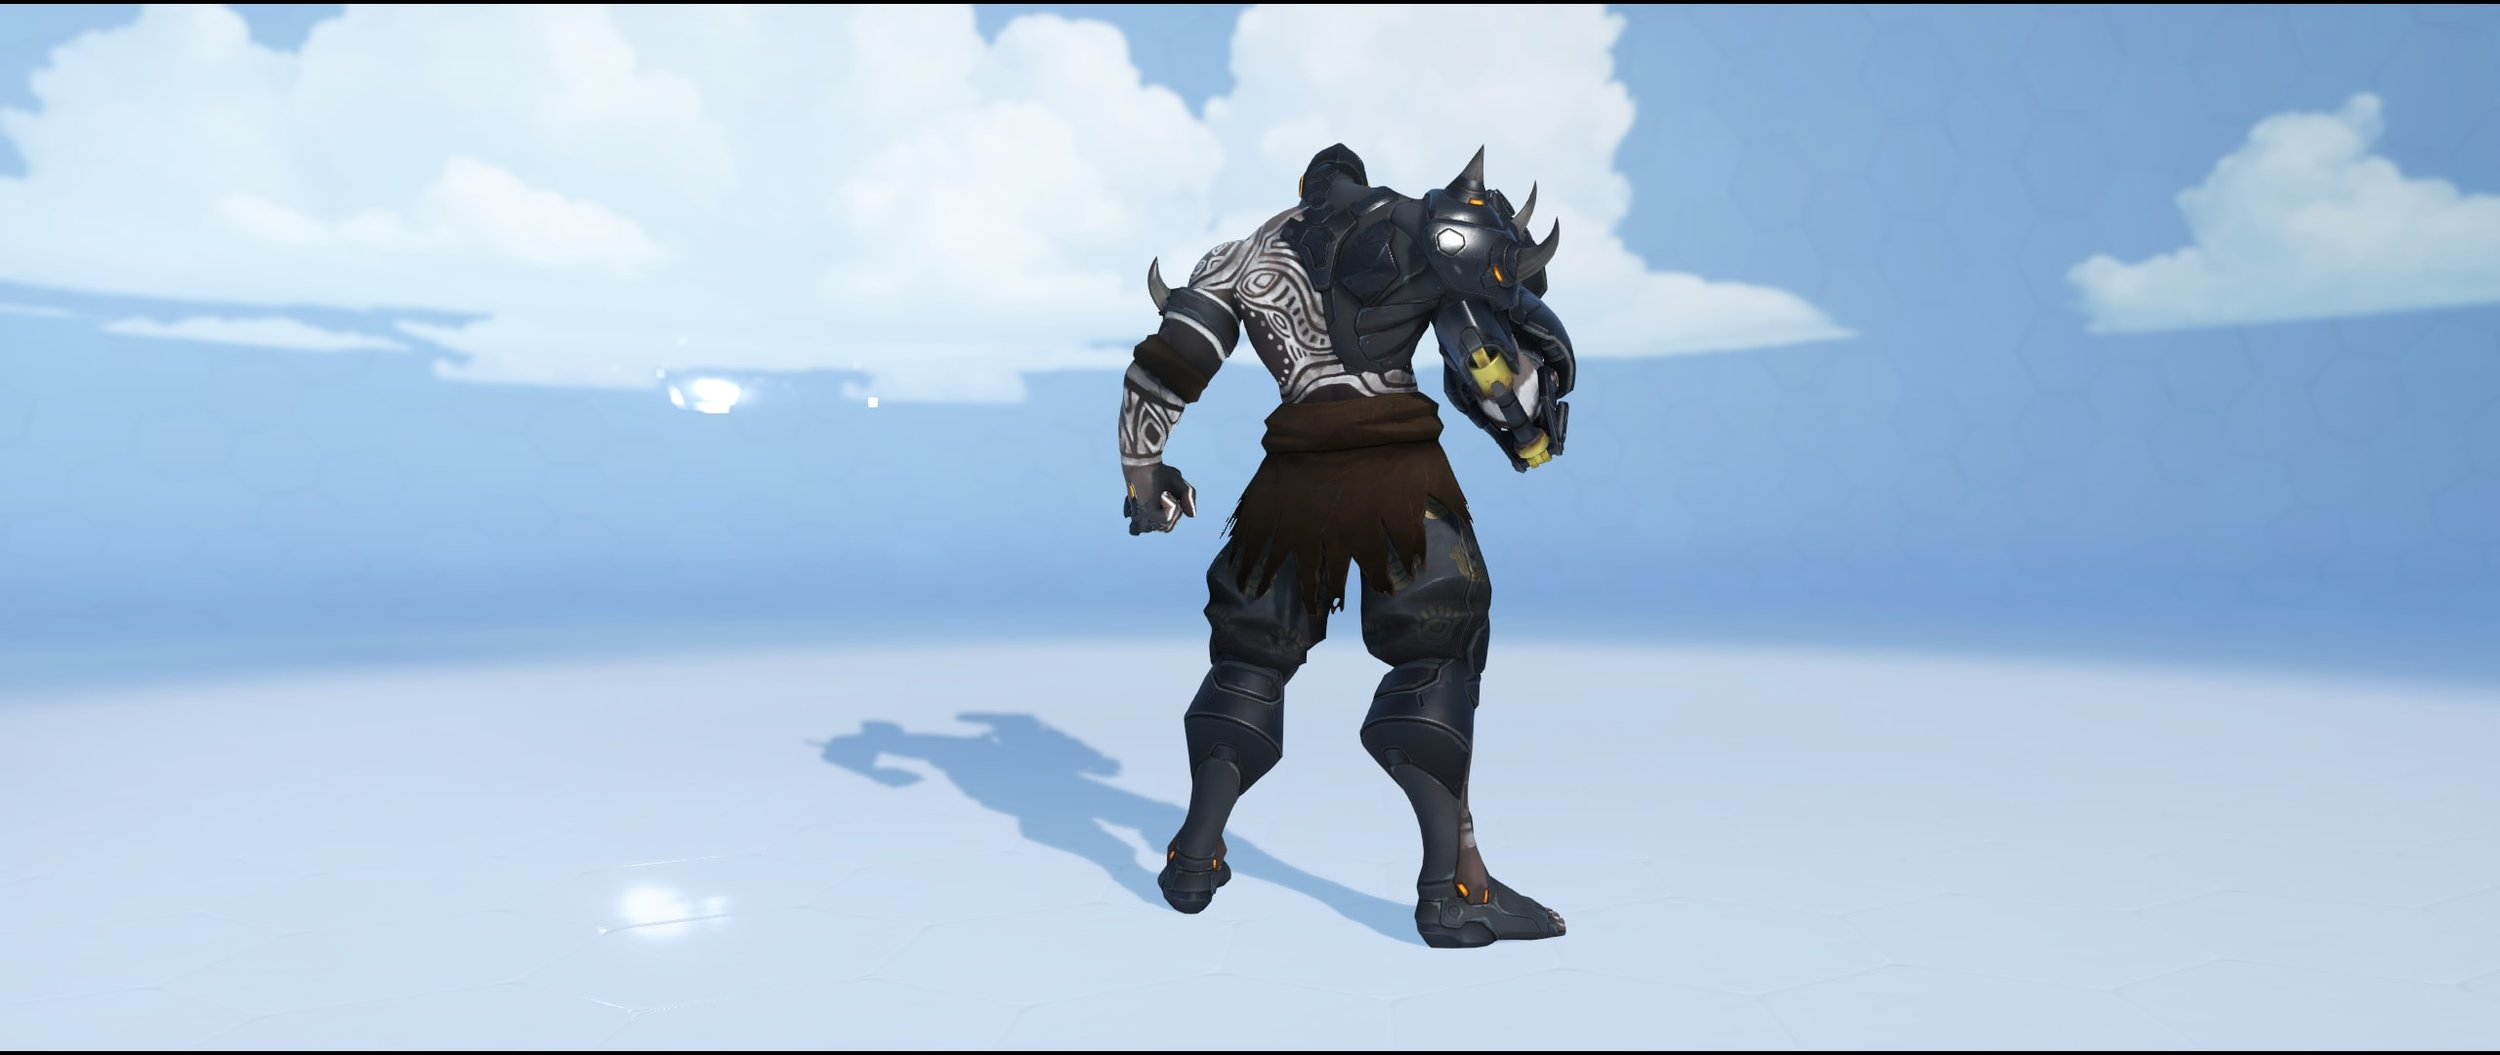 Painted back epic skin Doomfist Overwatch.jpg